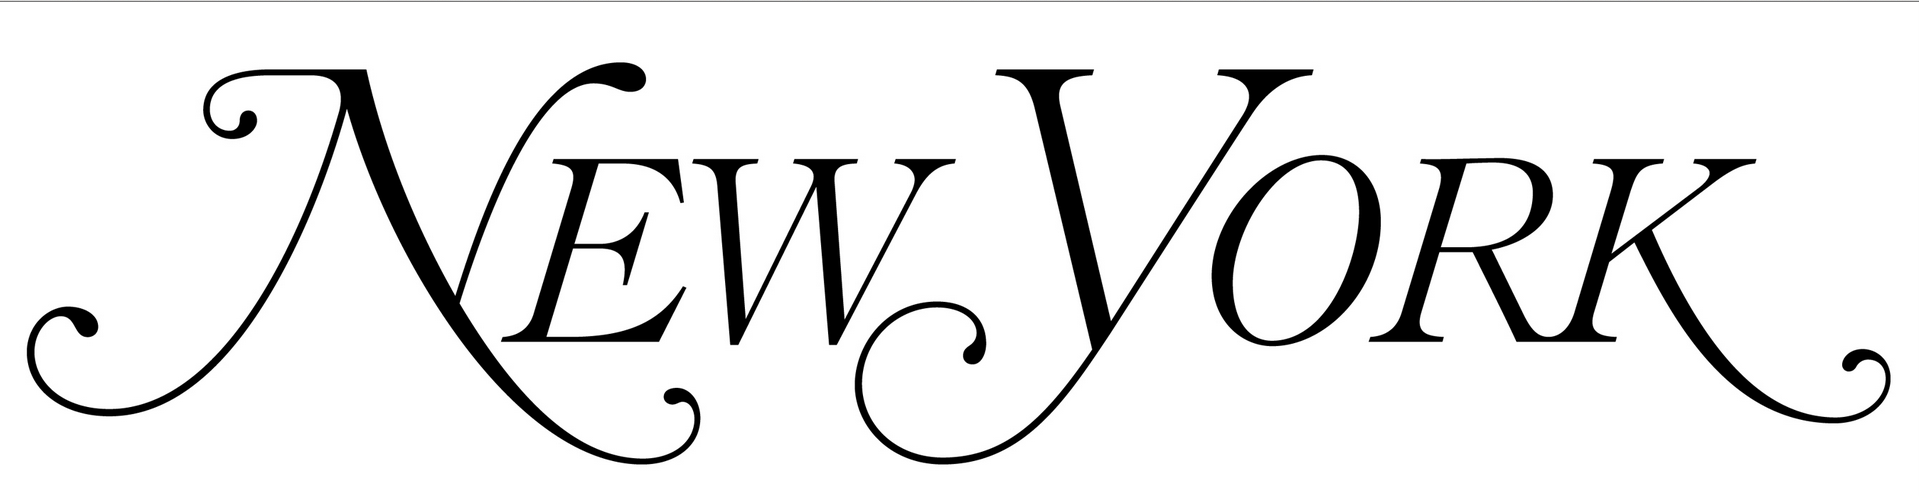 mewyorkmagazine-logo.jpg